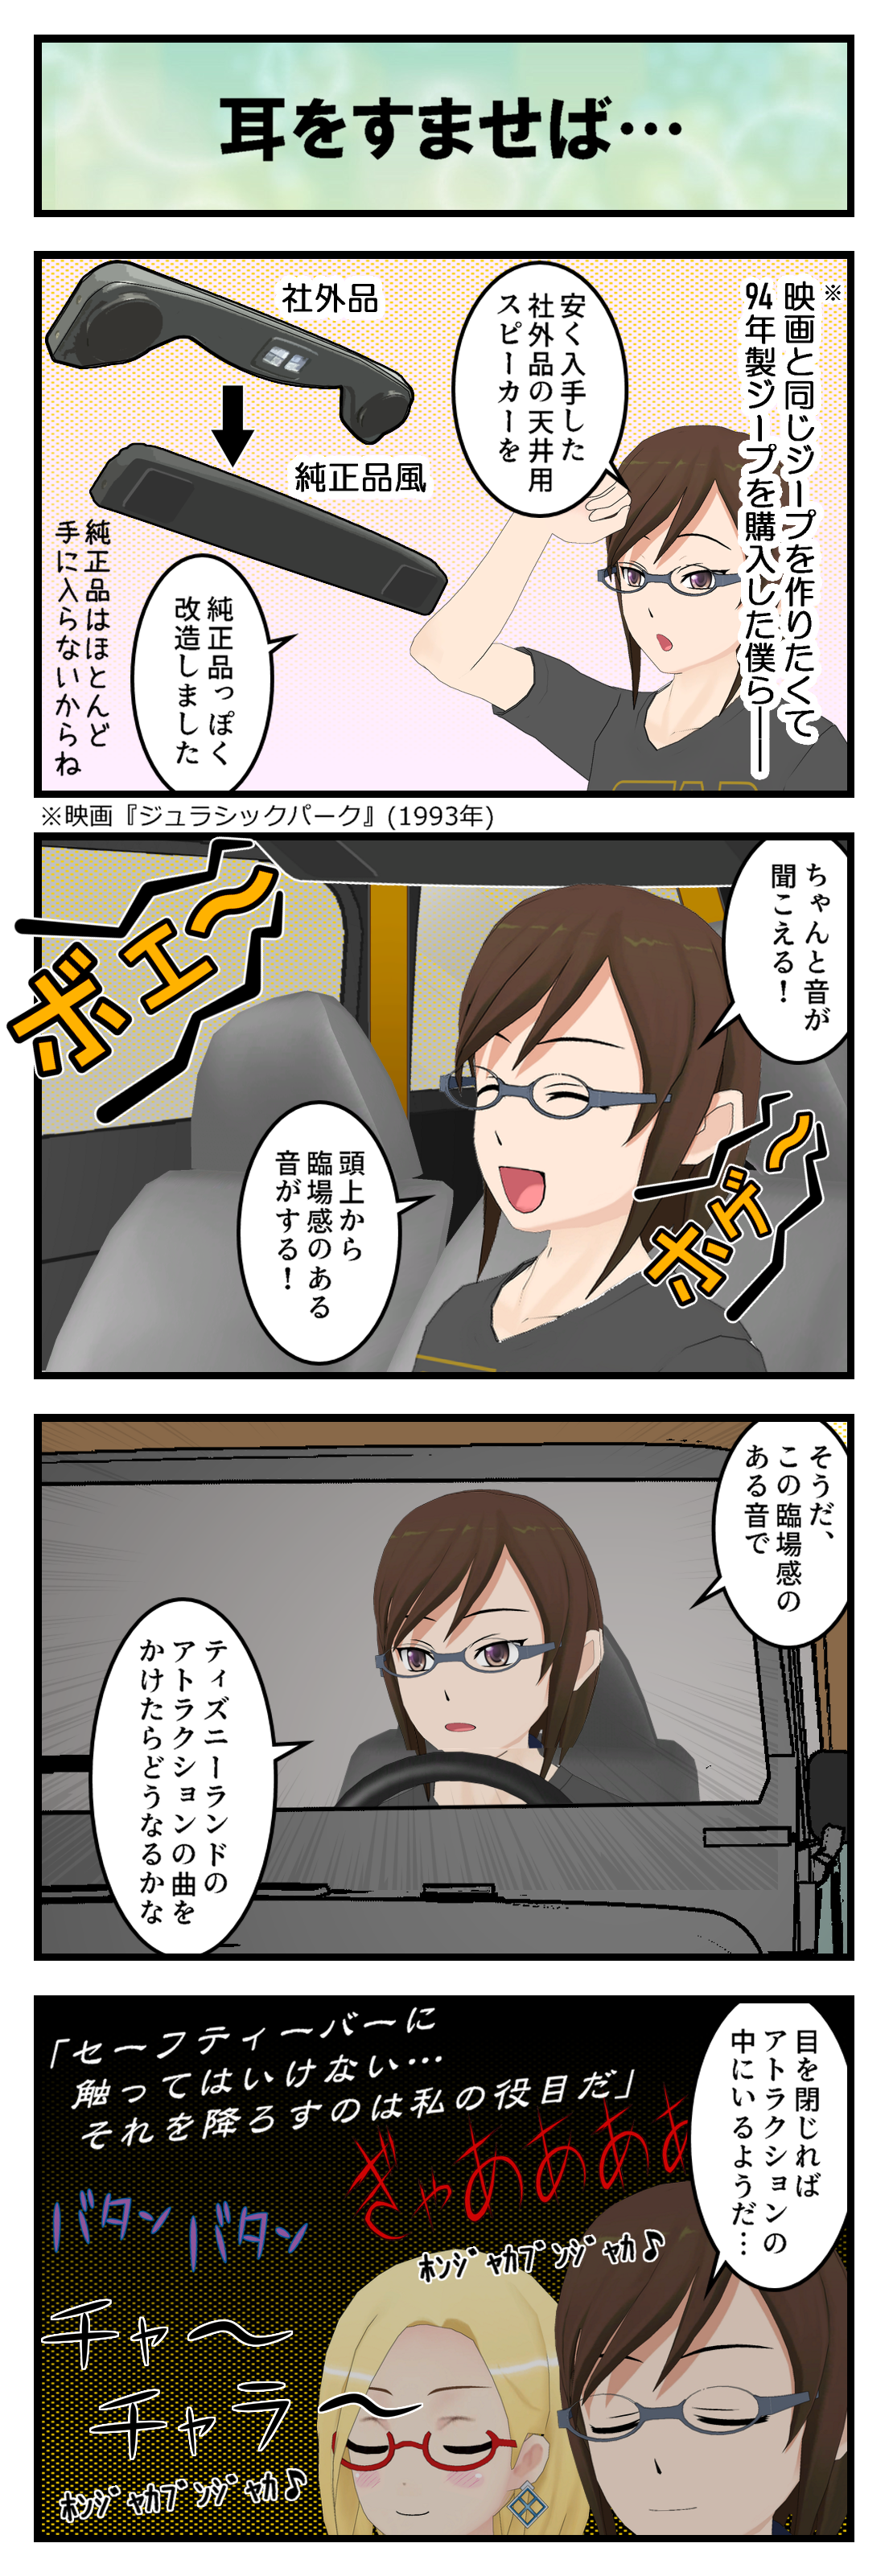 R828_スピーカー_001